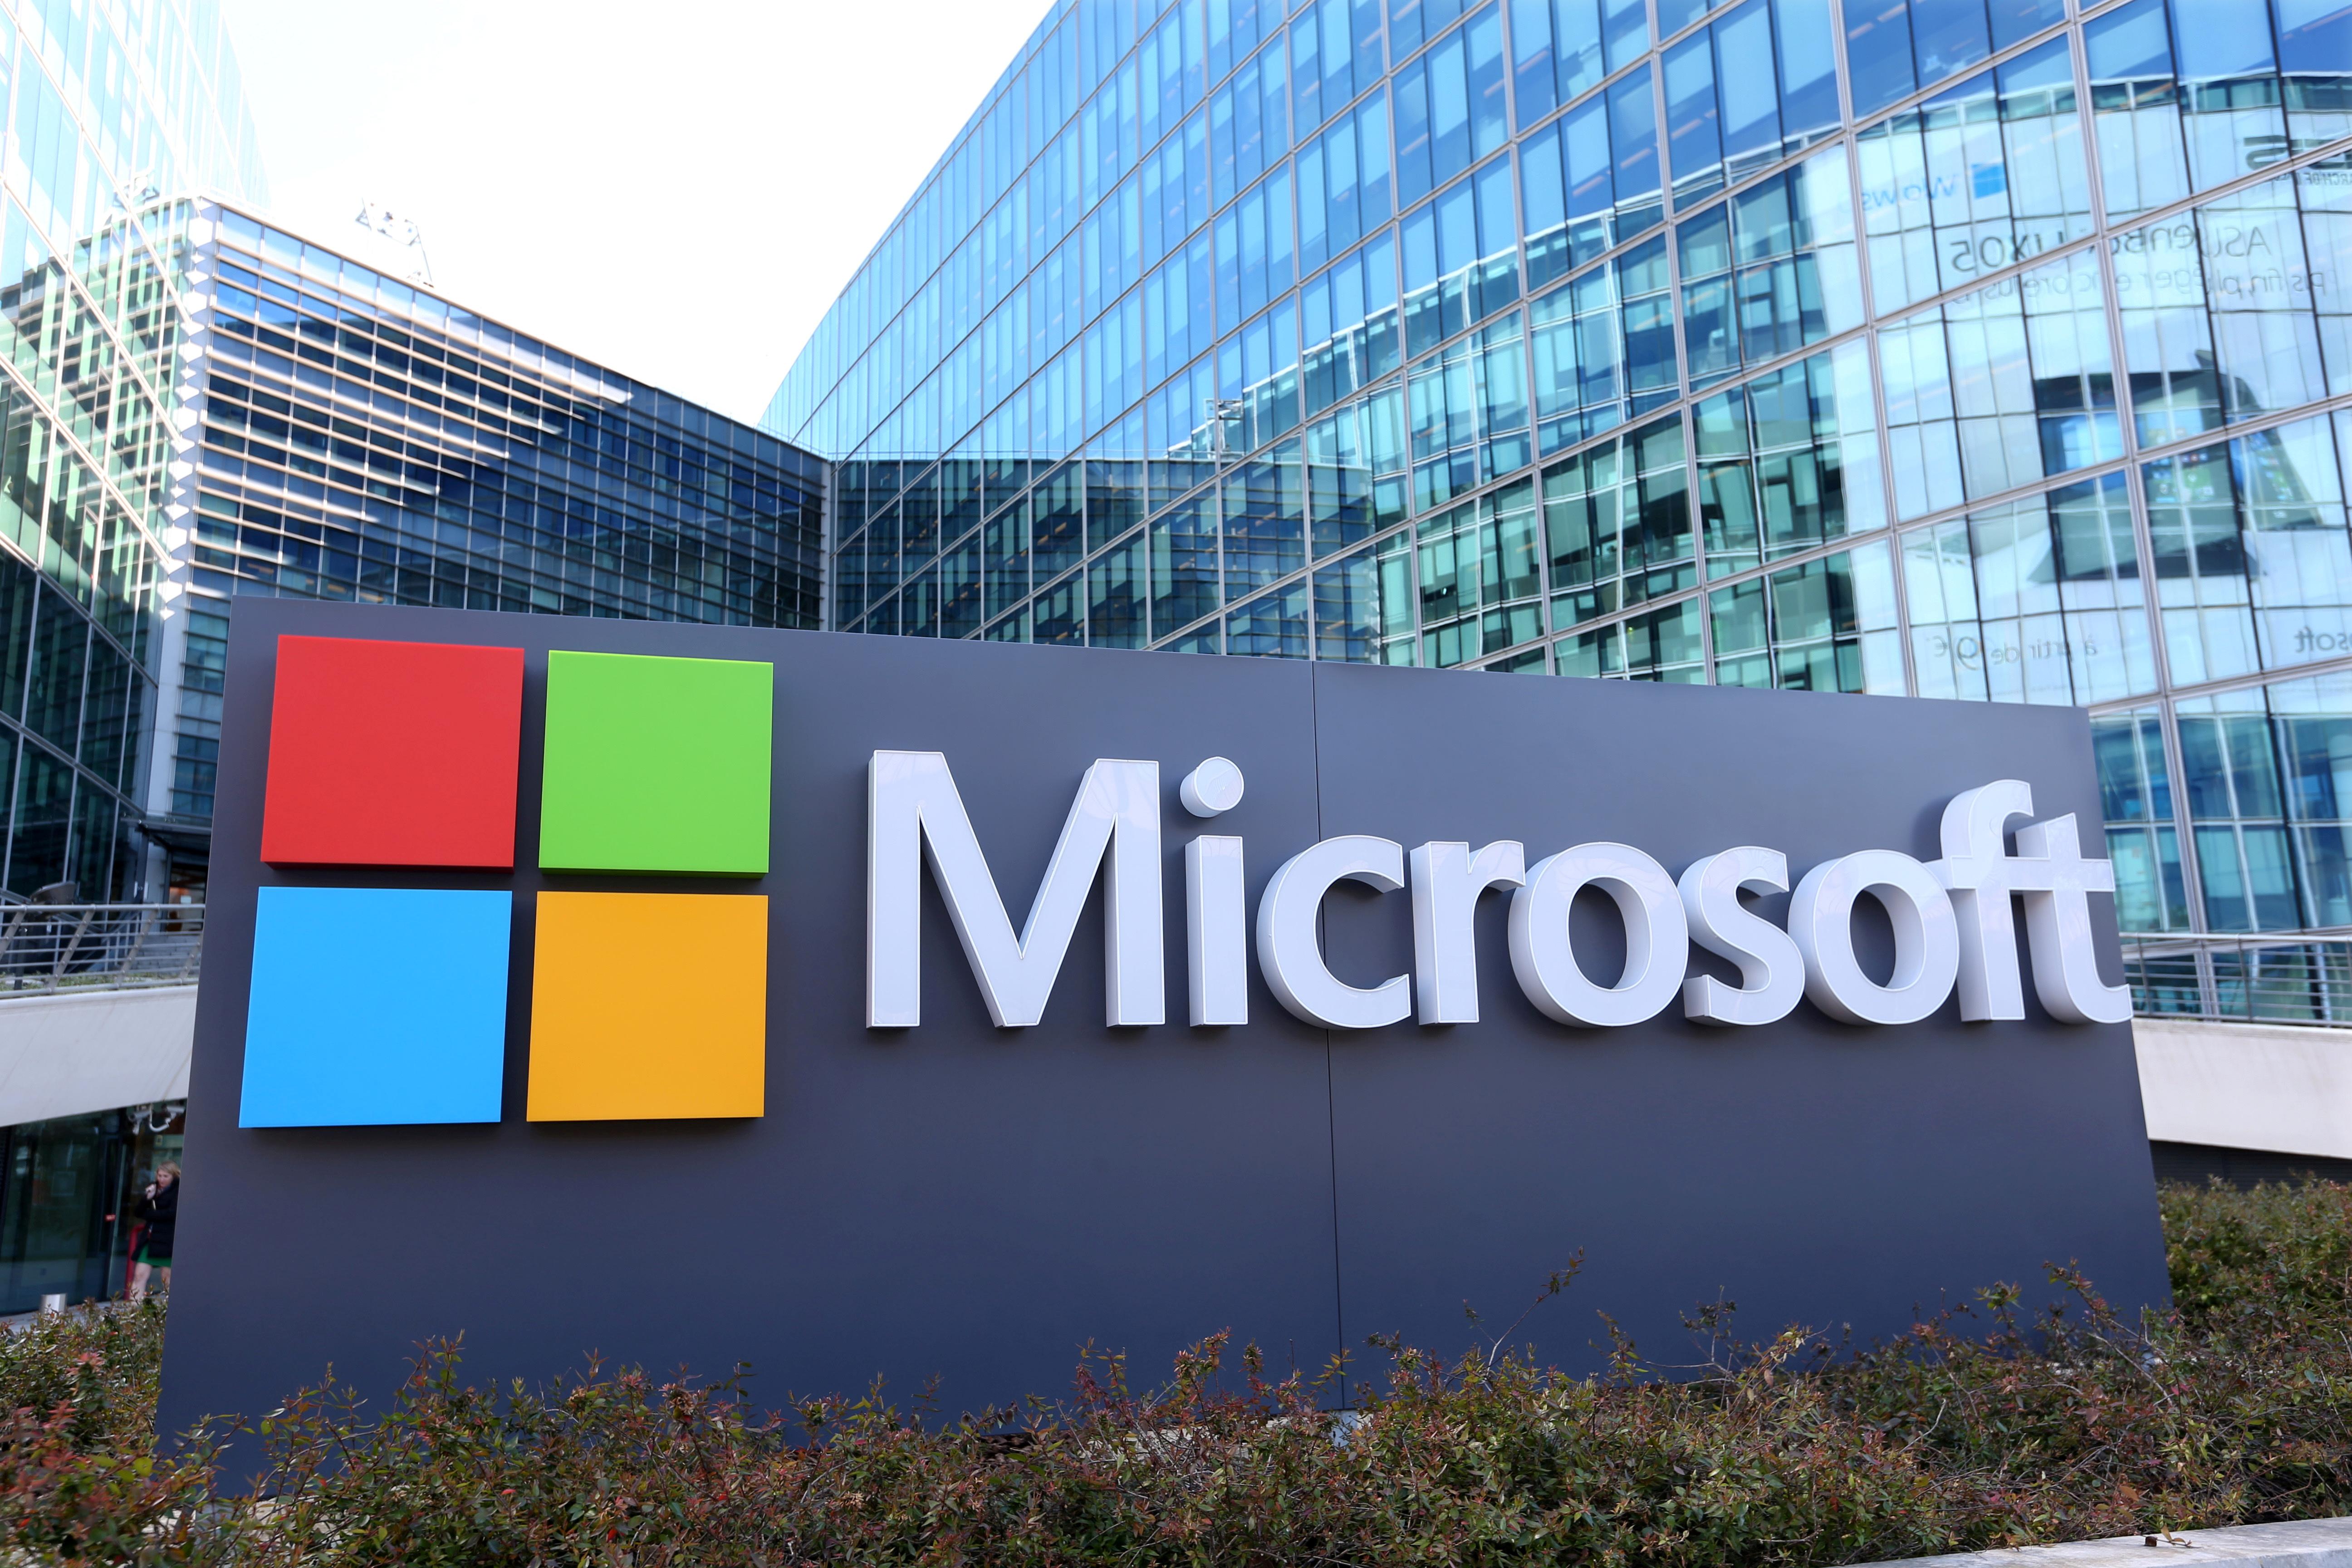 General view of Microsoft Corporation headquarters at Issy-les-Moulineaux, near Paris,  France, April 18, 2016. REUTERS/Charles Platiau/File Photo